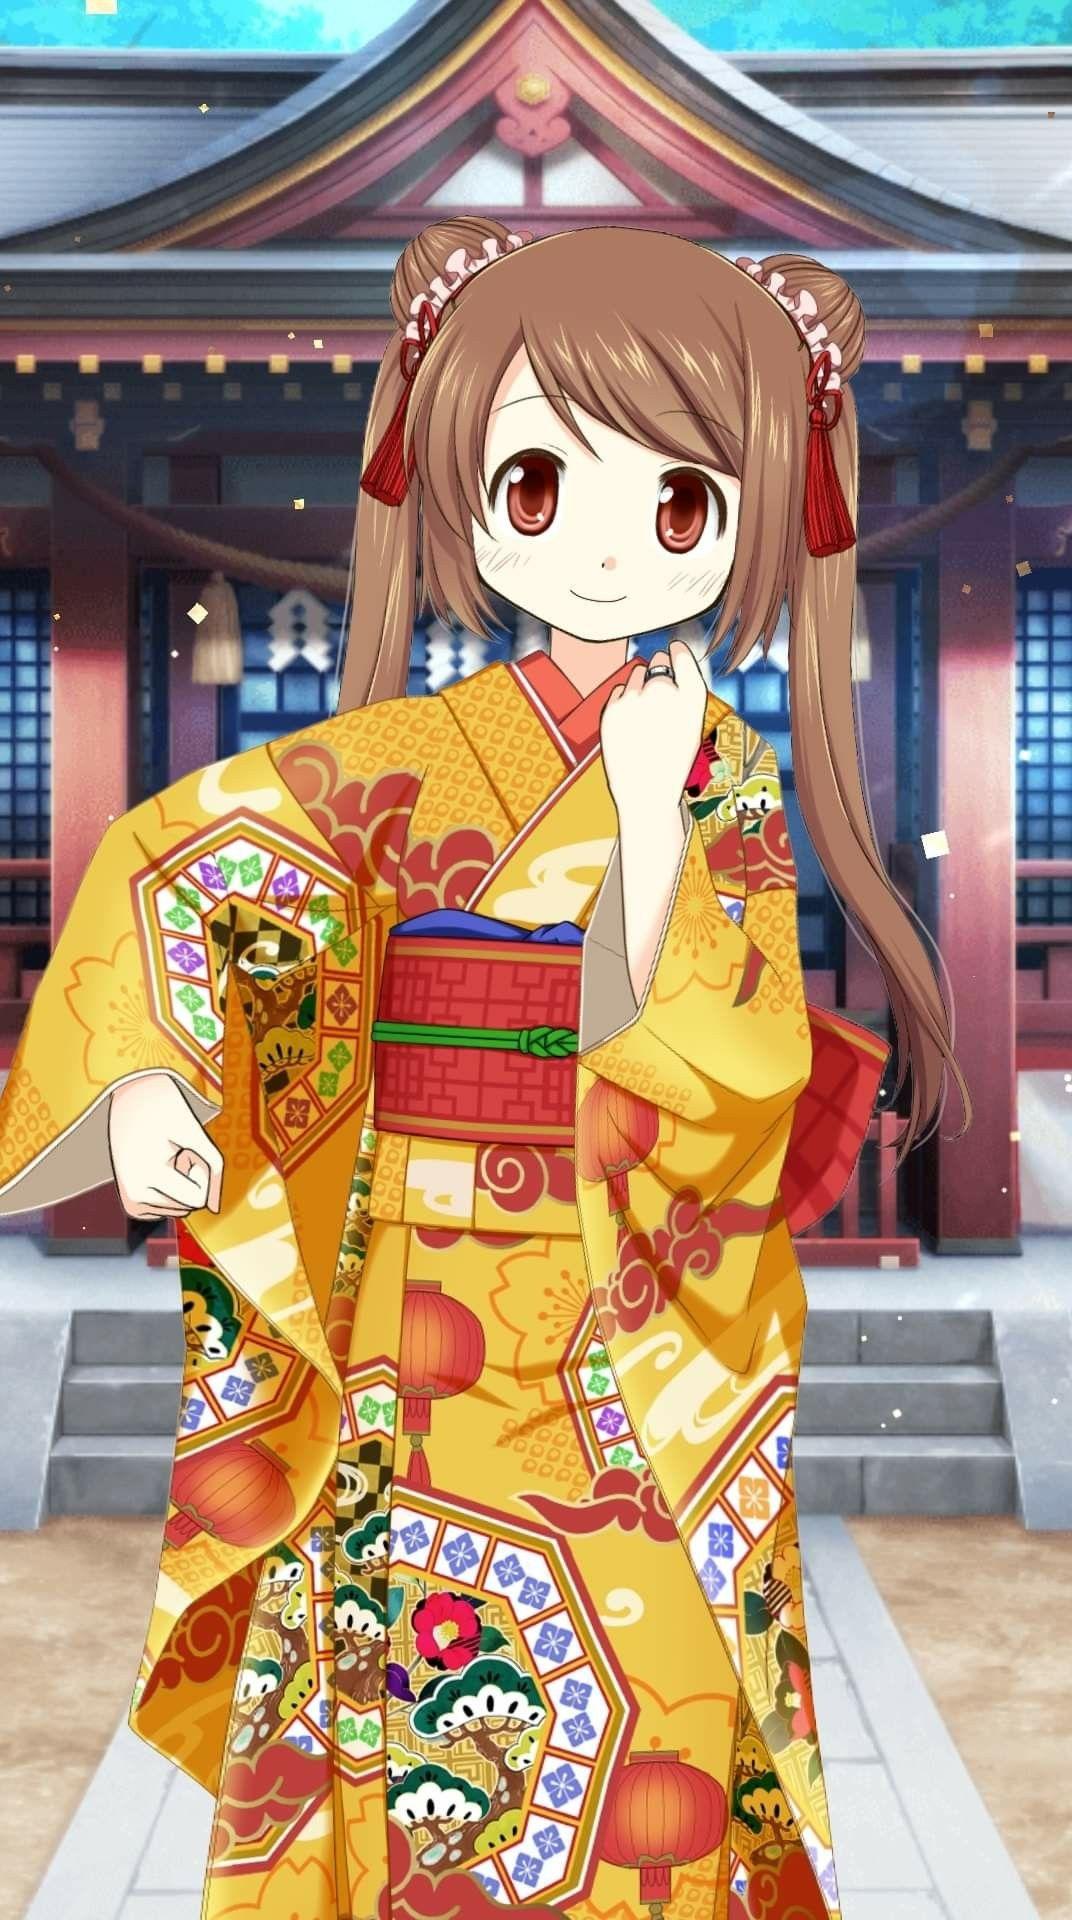 Pin by Koume on Anime Puella magi madoka magica, Anime